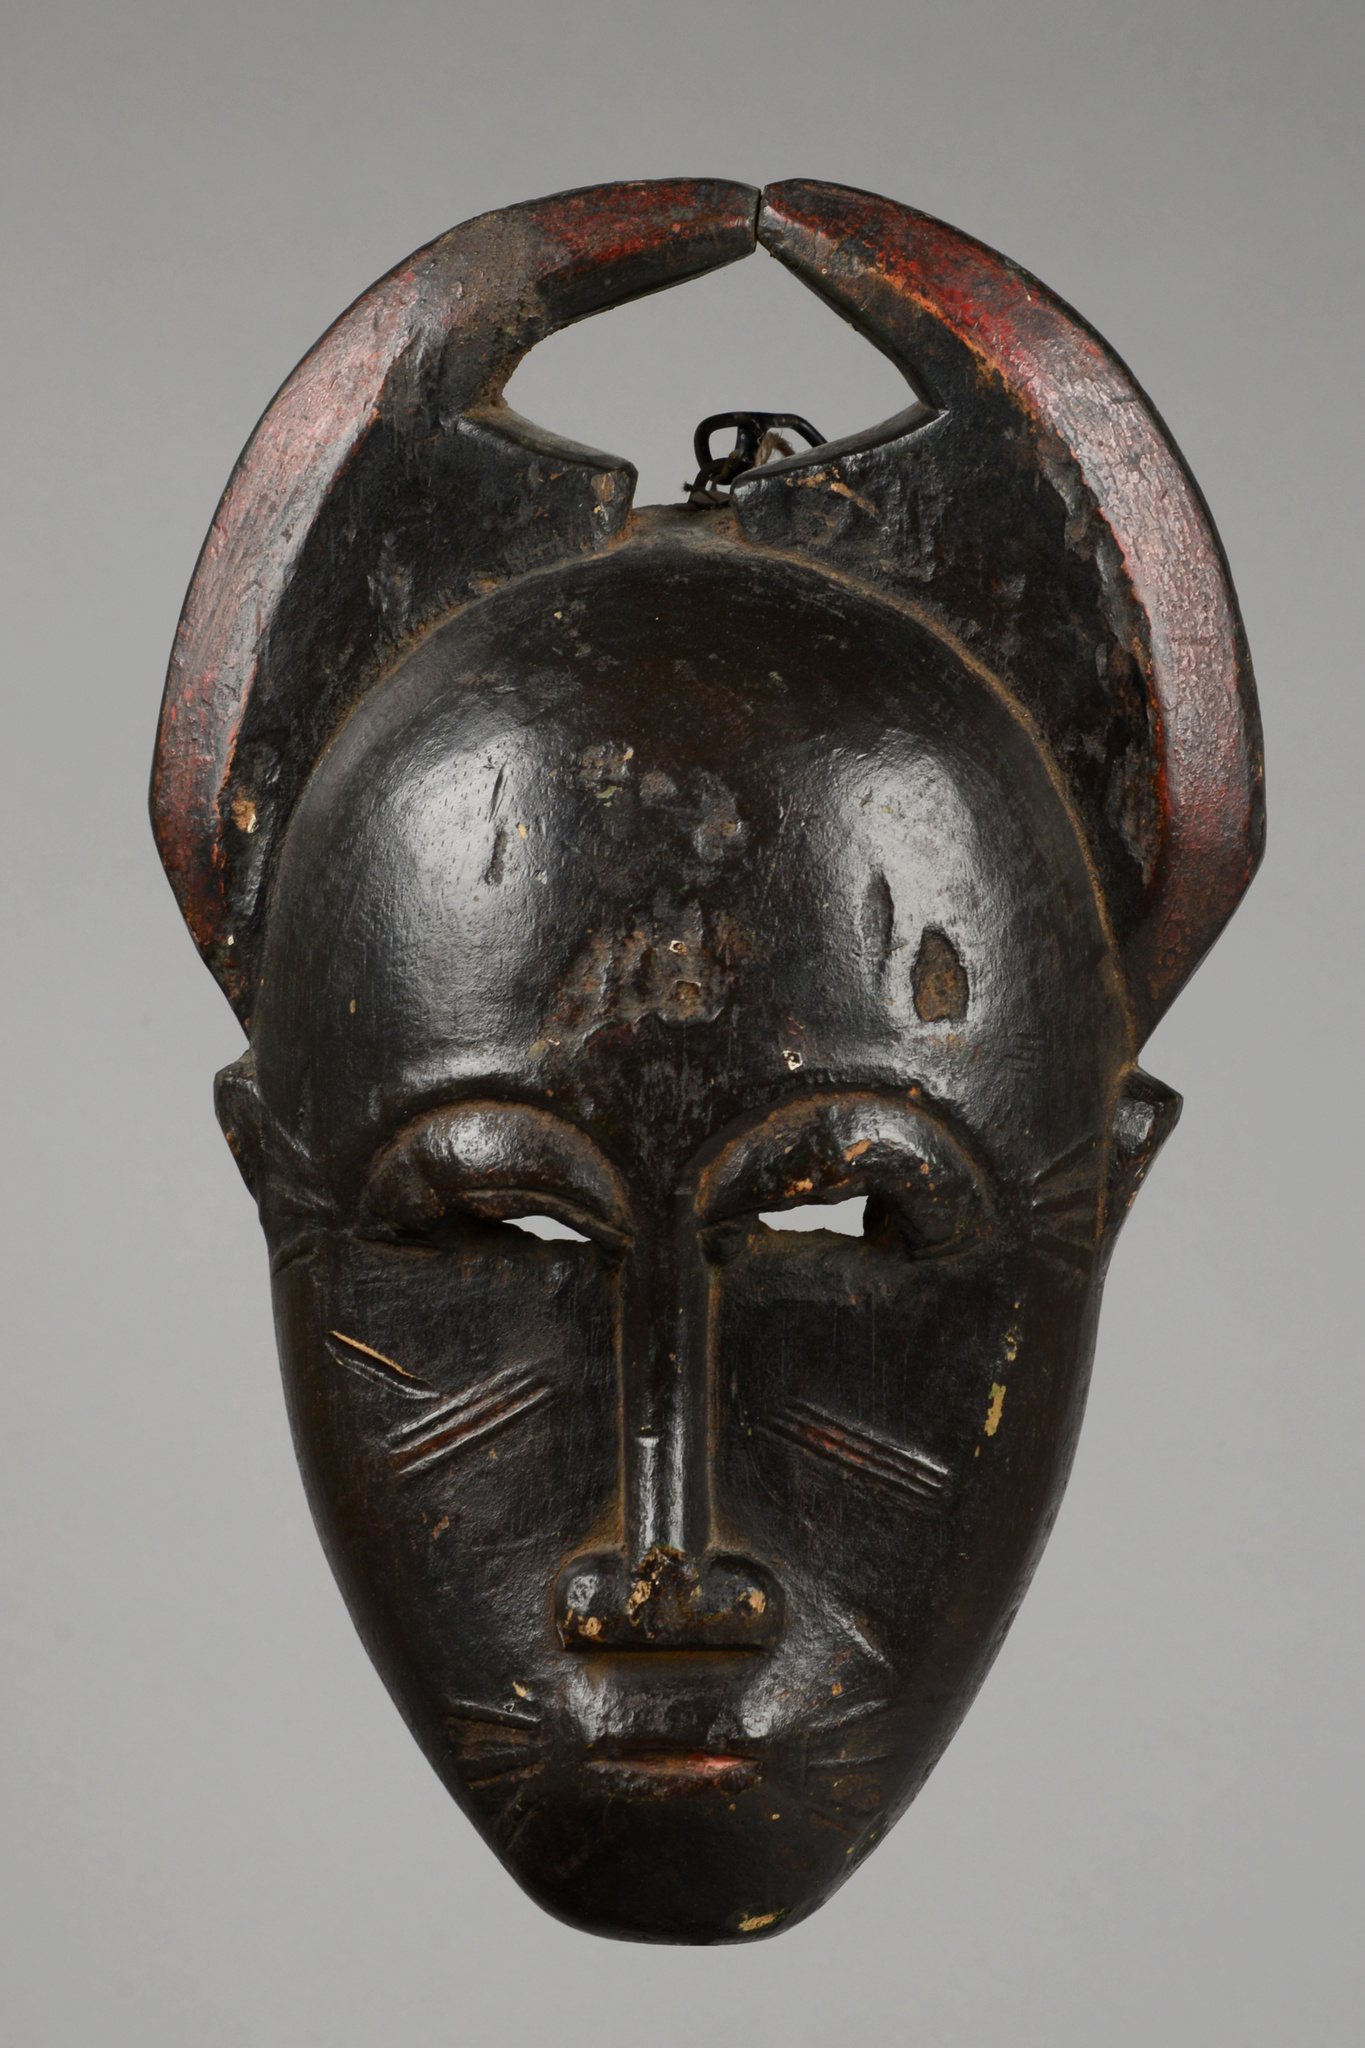 Anthropo-/ zoomorphic face mask